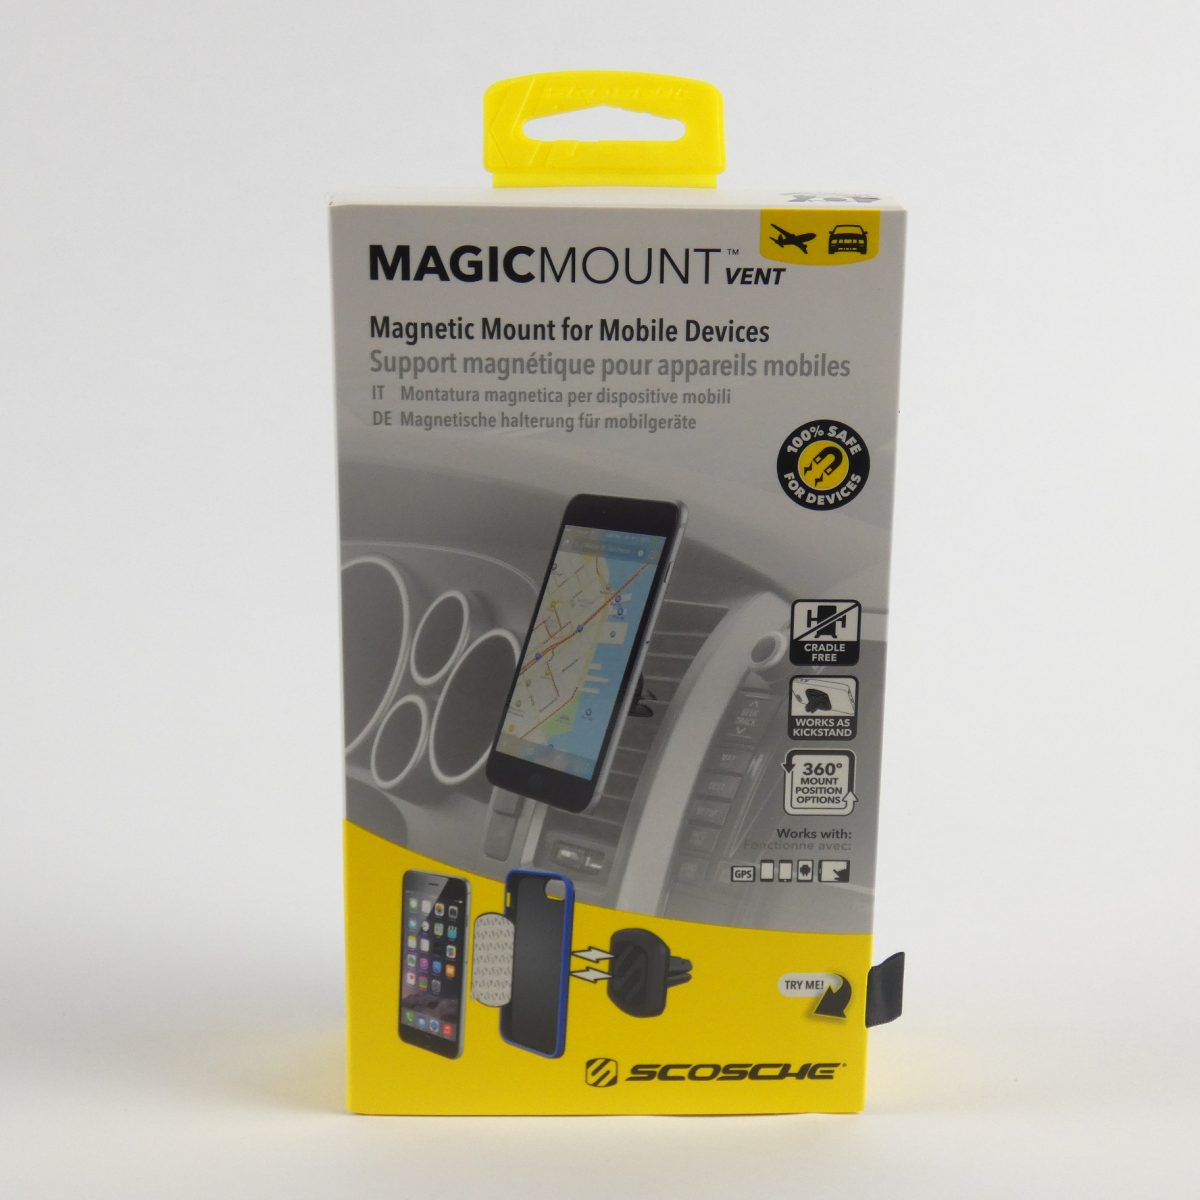 Stickgrip kwaltieithouder Magicmount boetevrij